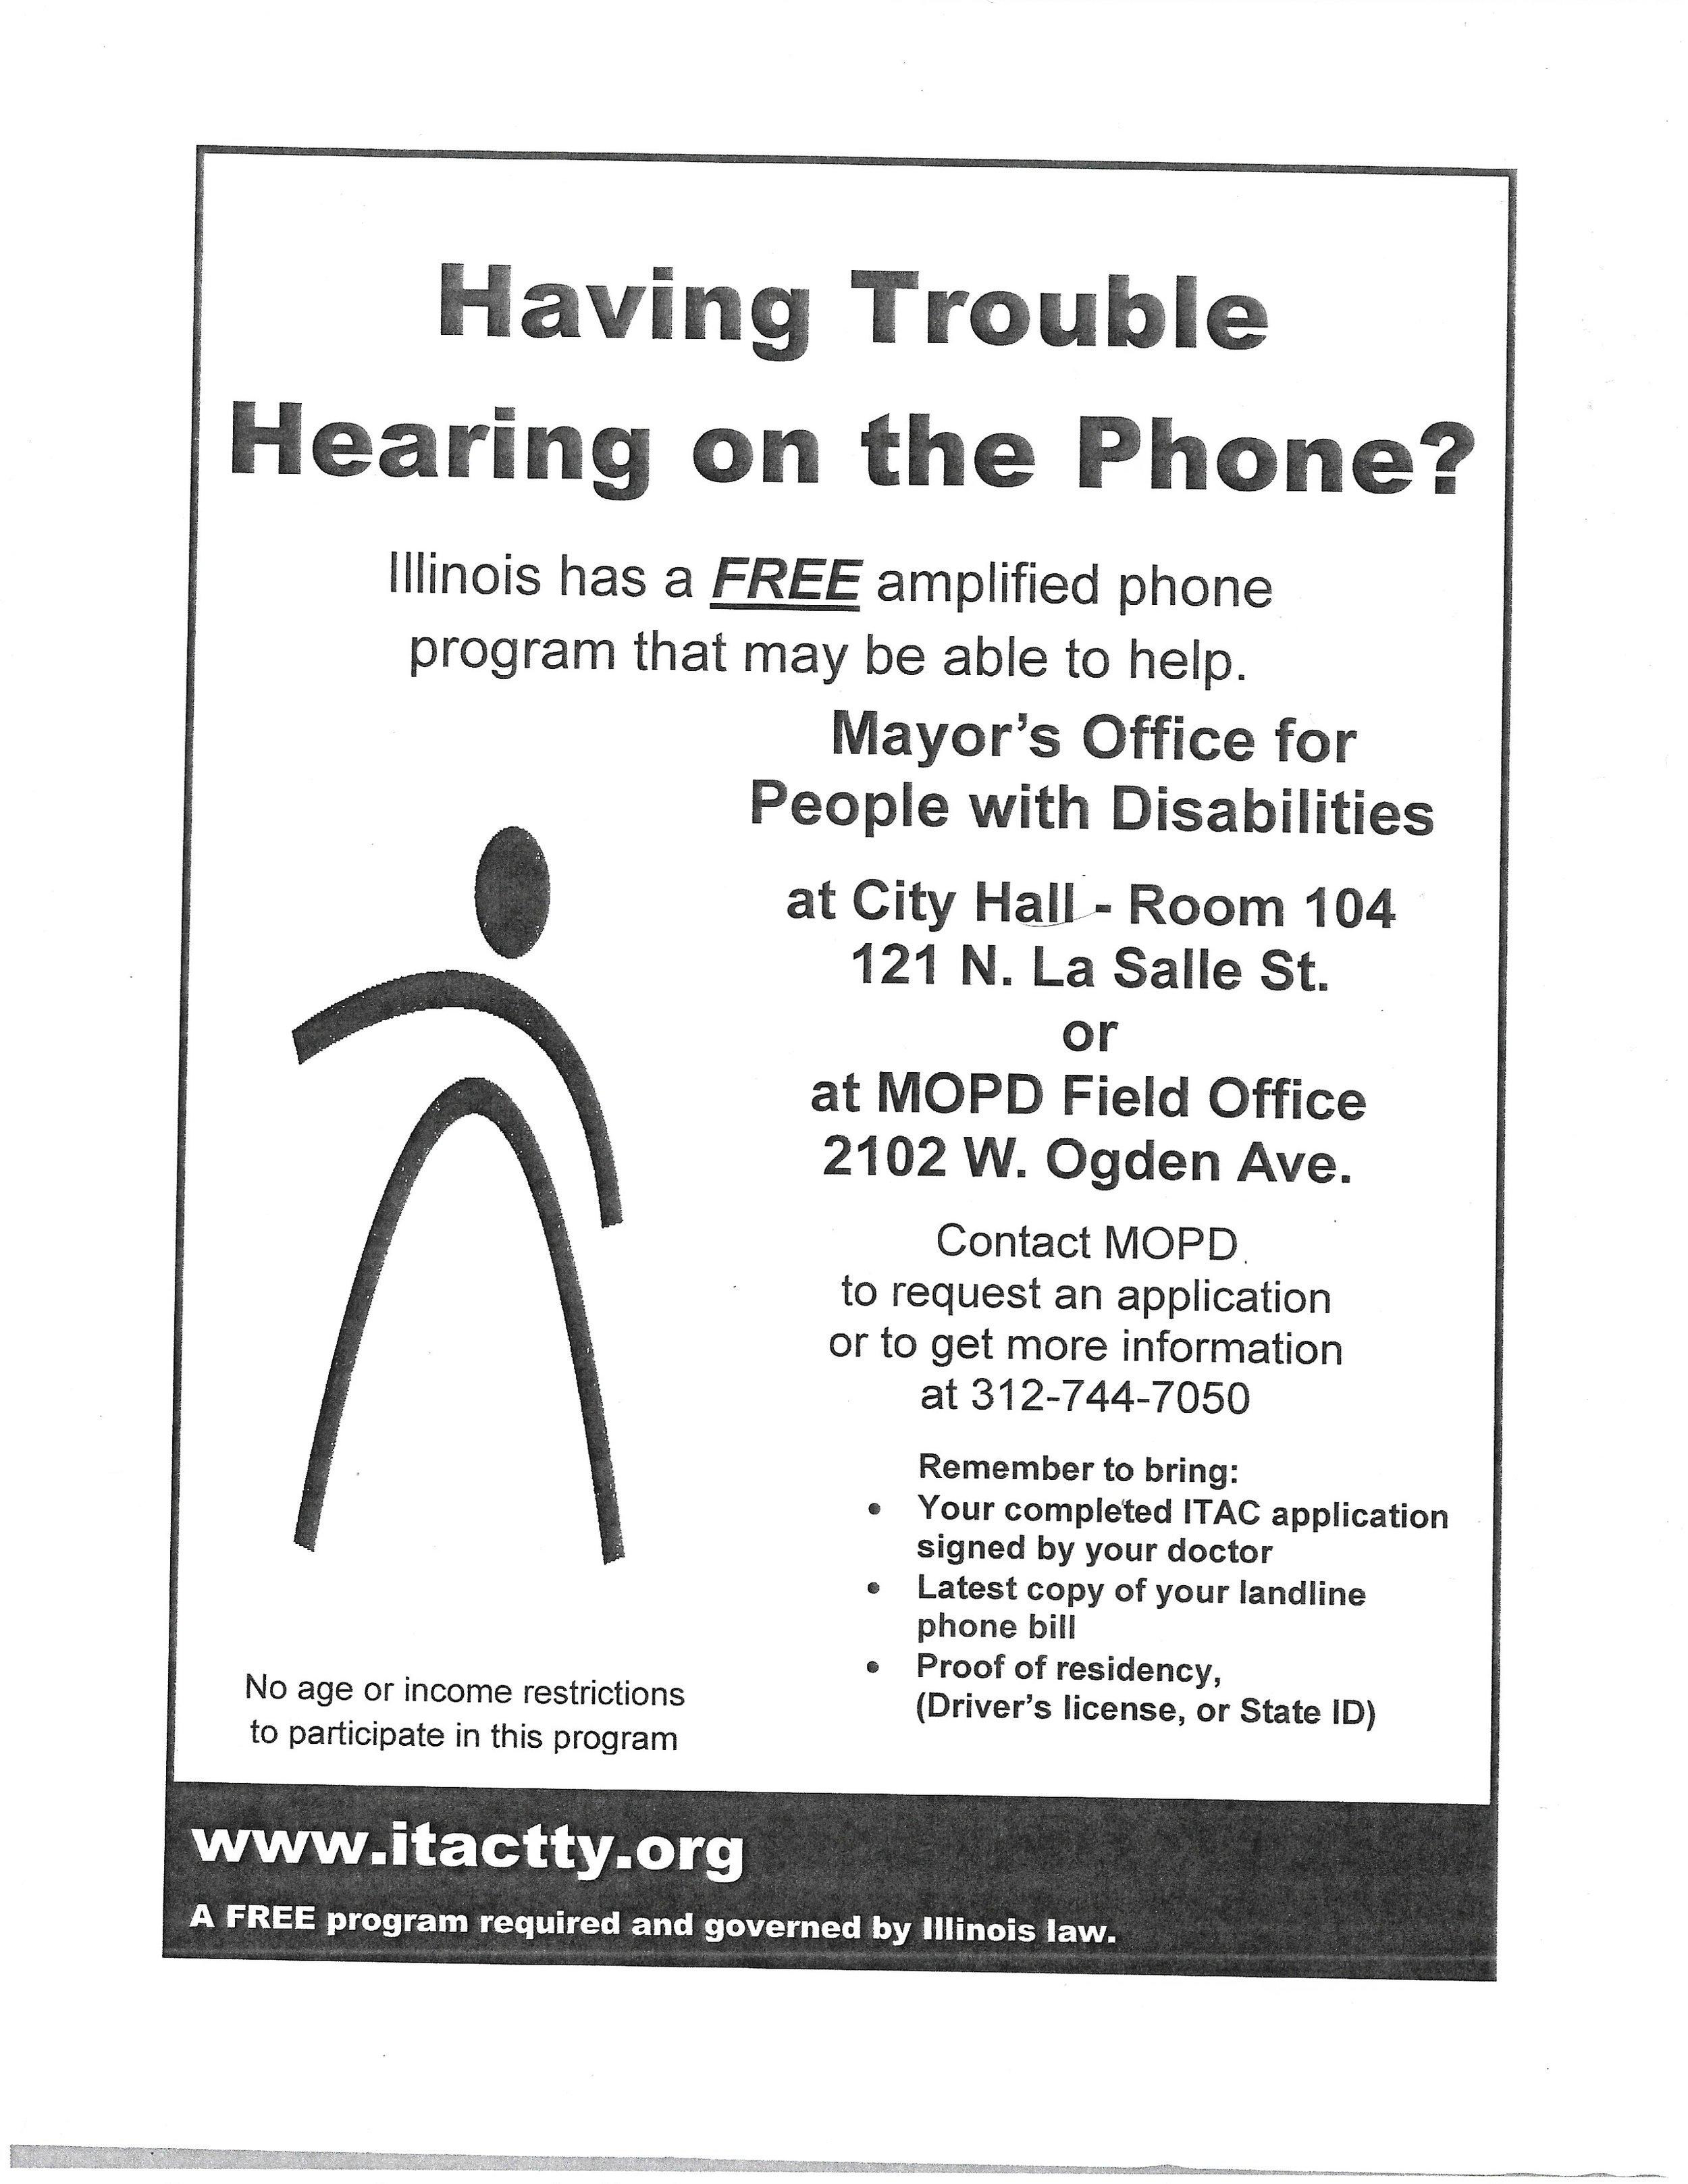 HearingIssues Phone.jpeg